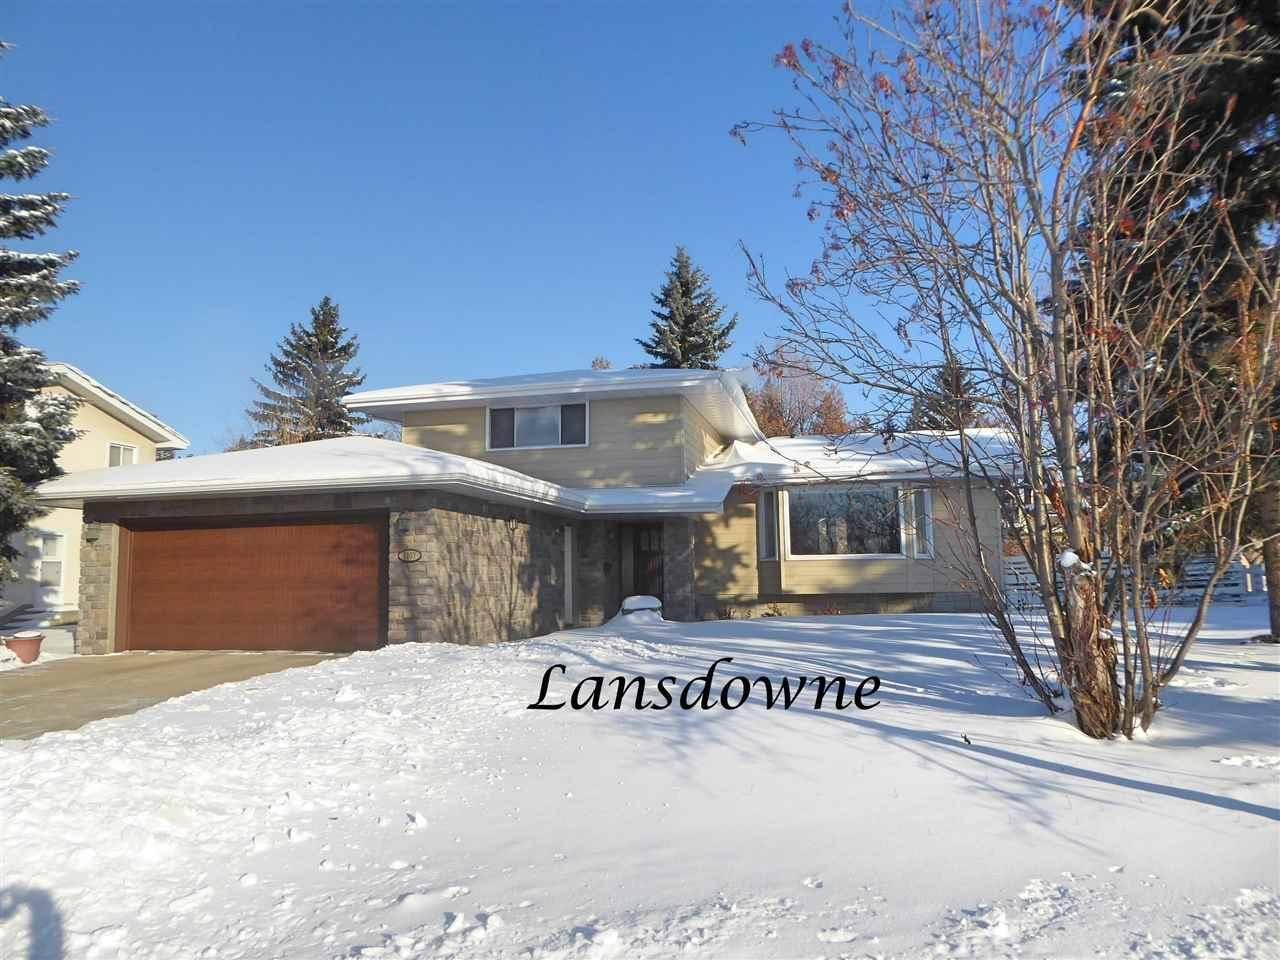 House for sale at 5103 Lansdowne Dr Nw Edmonton Alberta - MLS: E4184357